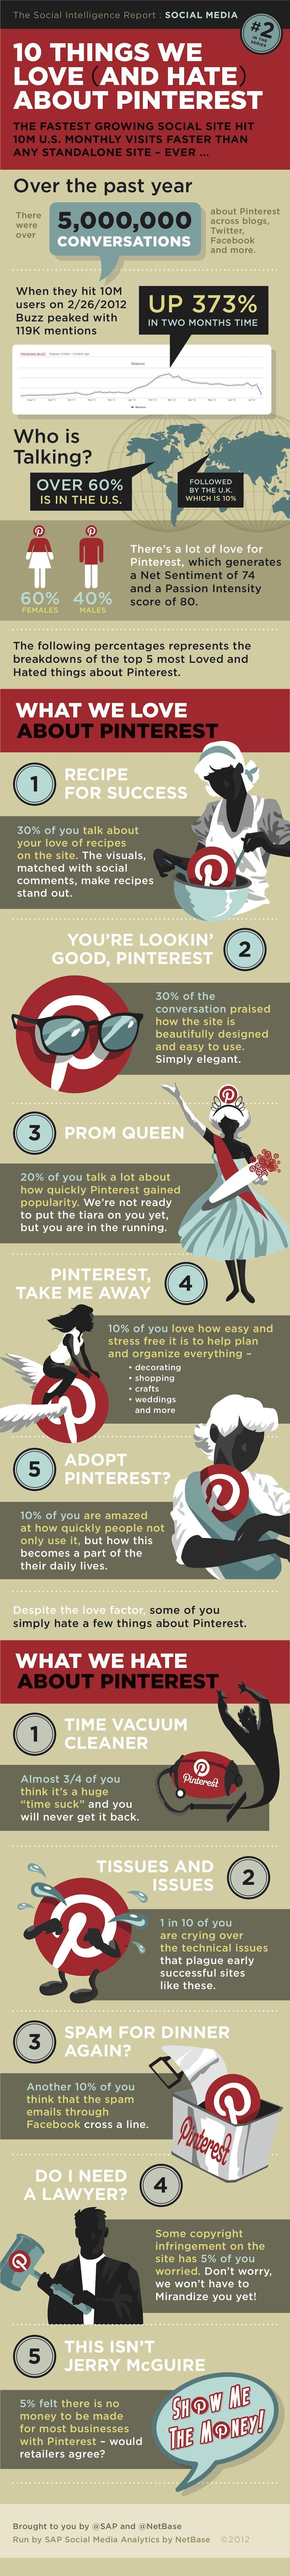 Pinterest-love-hate-infographic